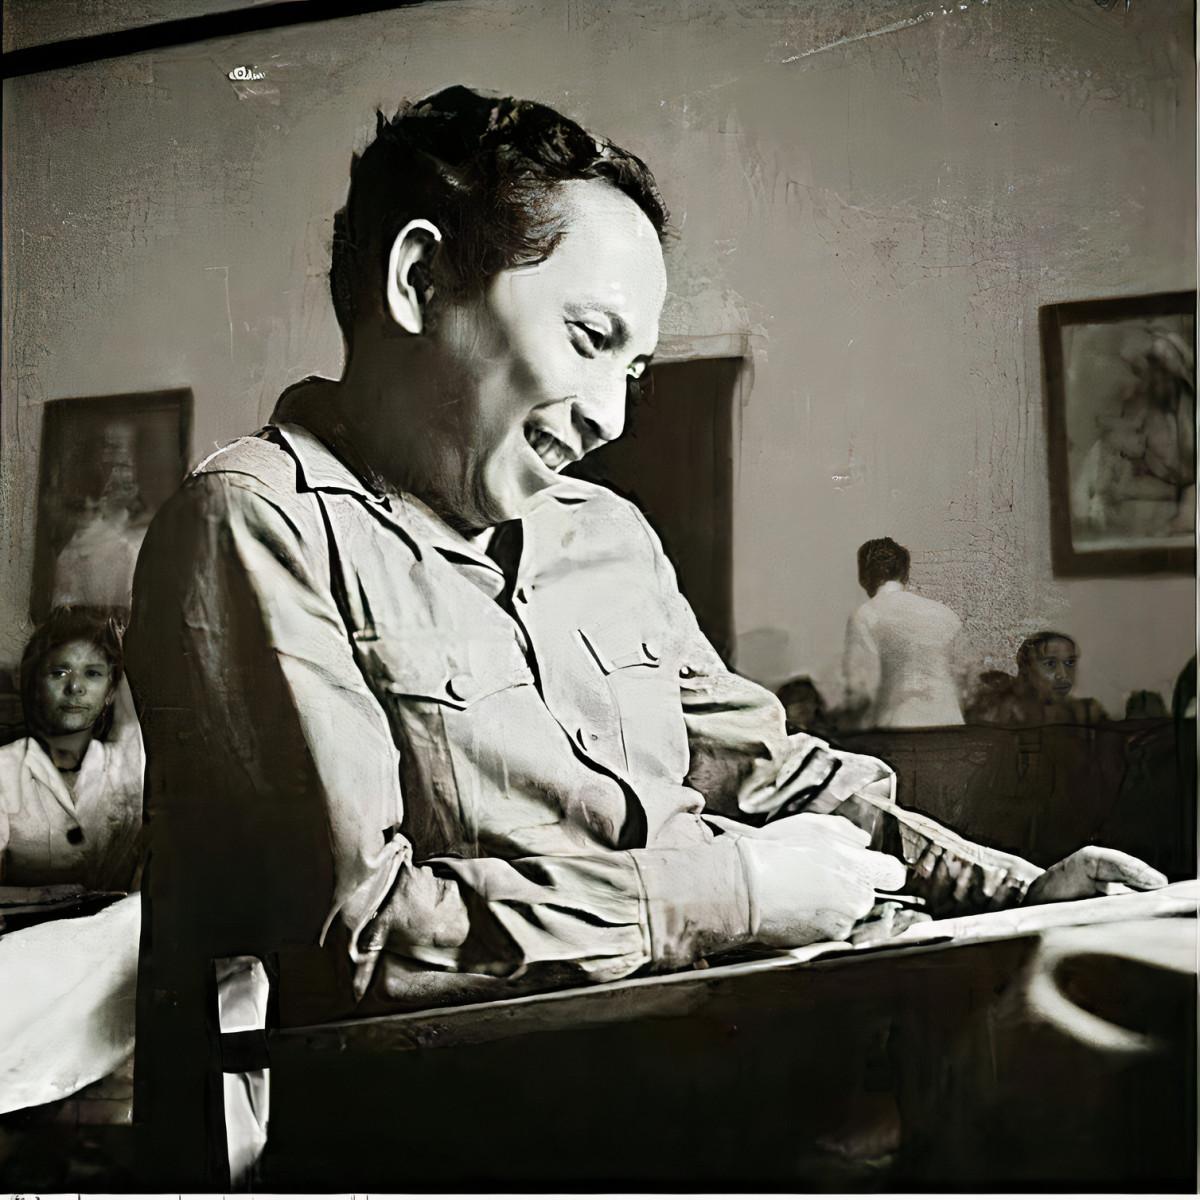 Sejarah Hari Ini (9 April 1966) - Wafatnya Sutan Sjahrir, Bung Kecil yang Berjiwa Besar